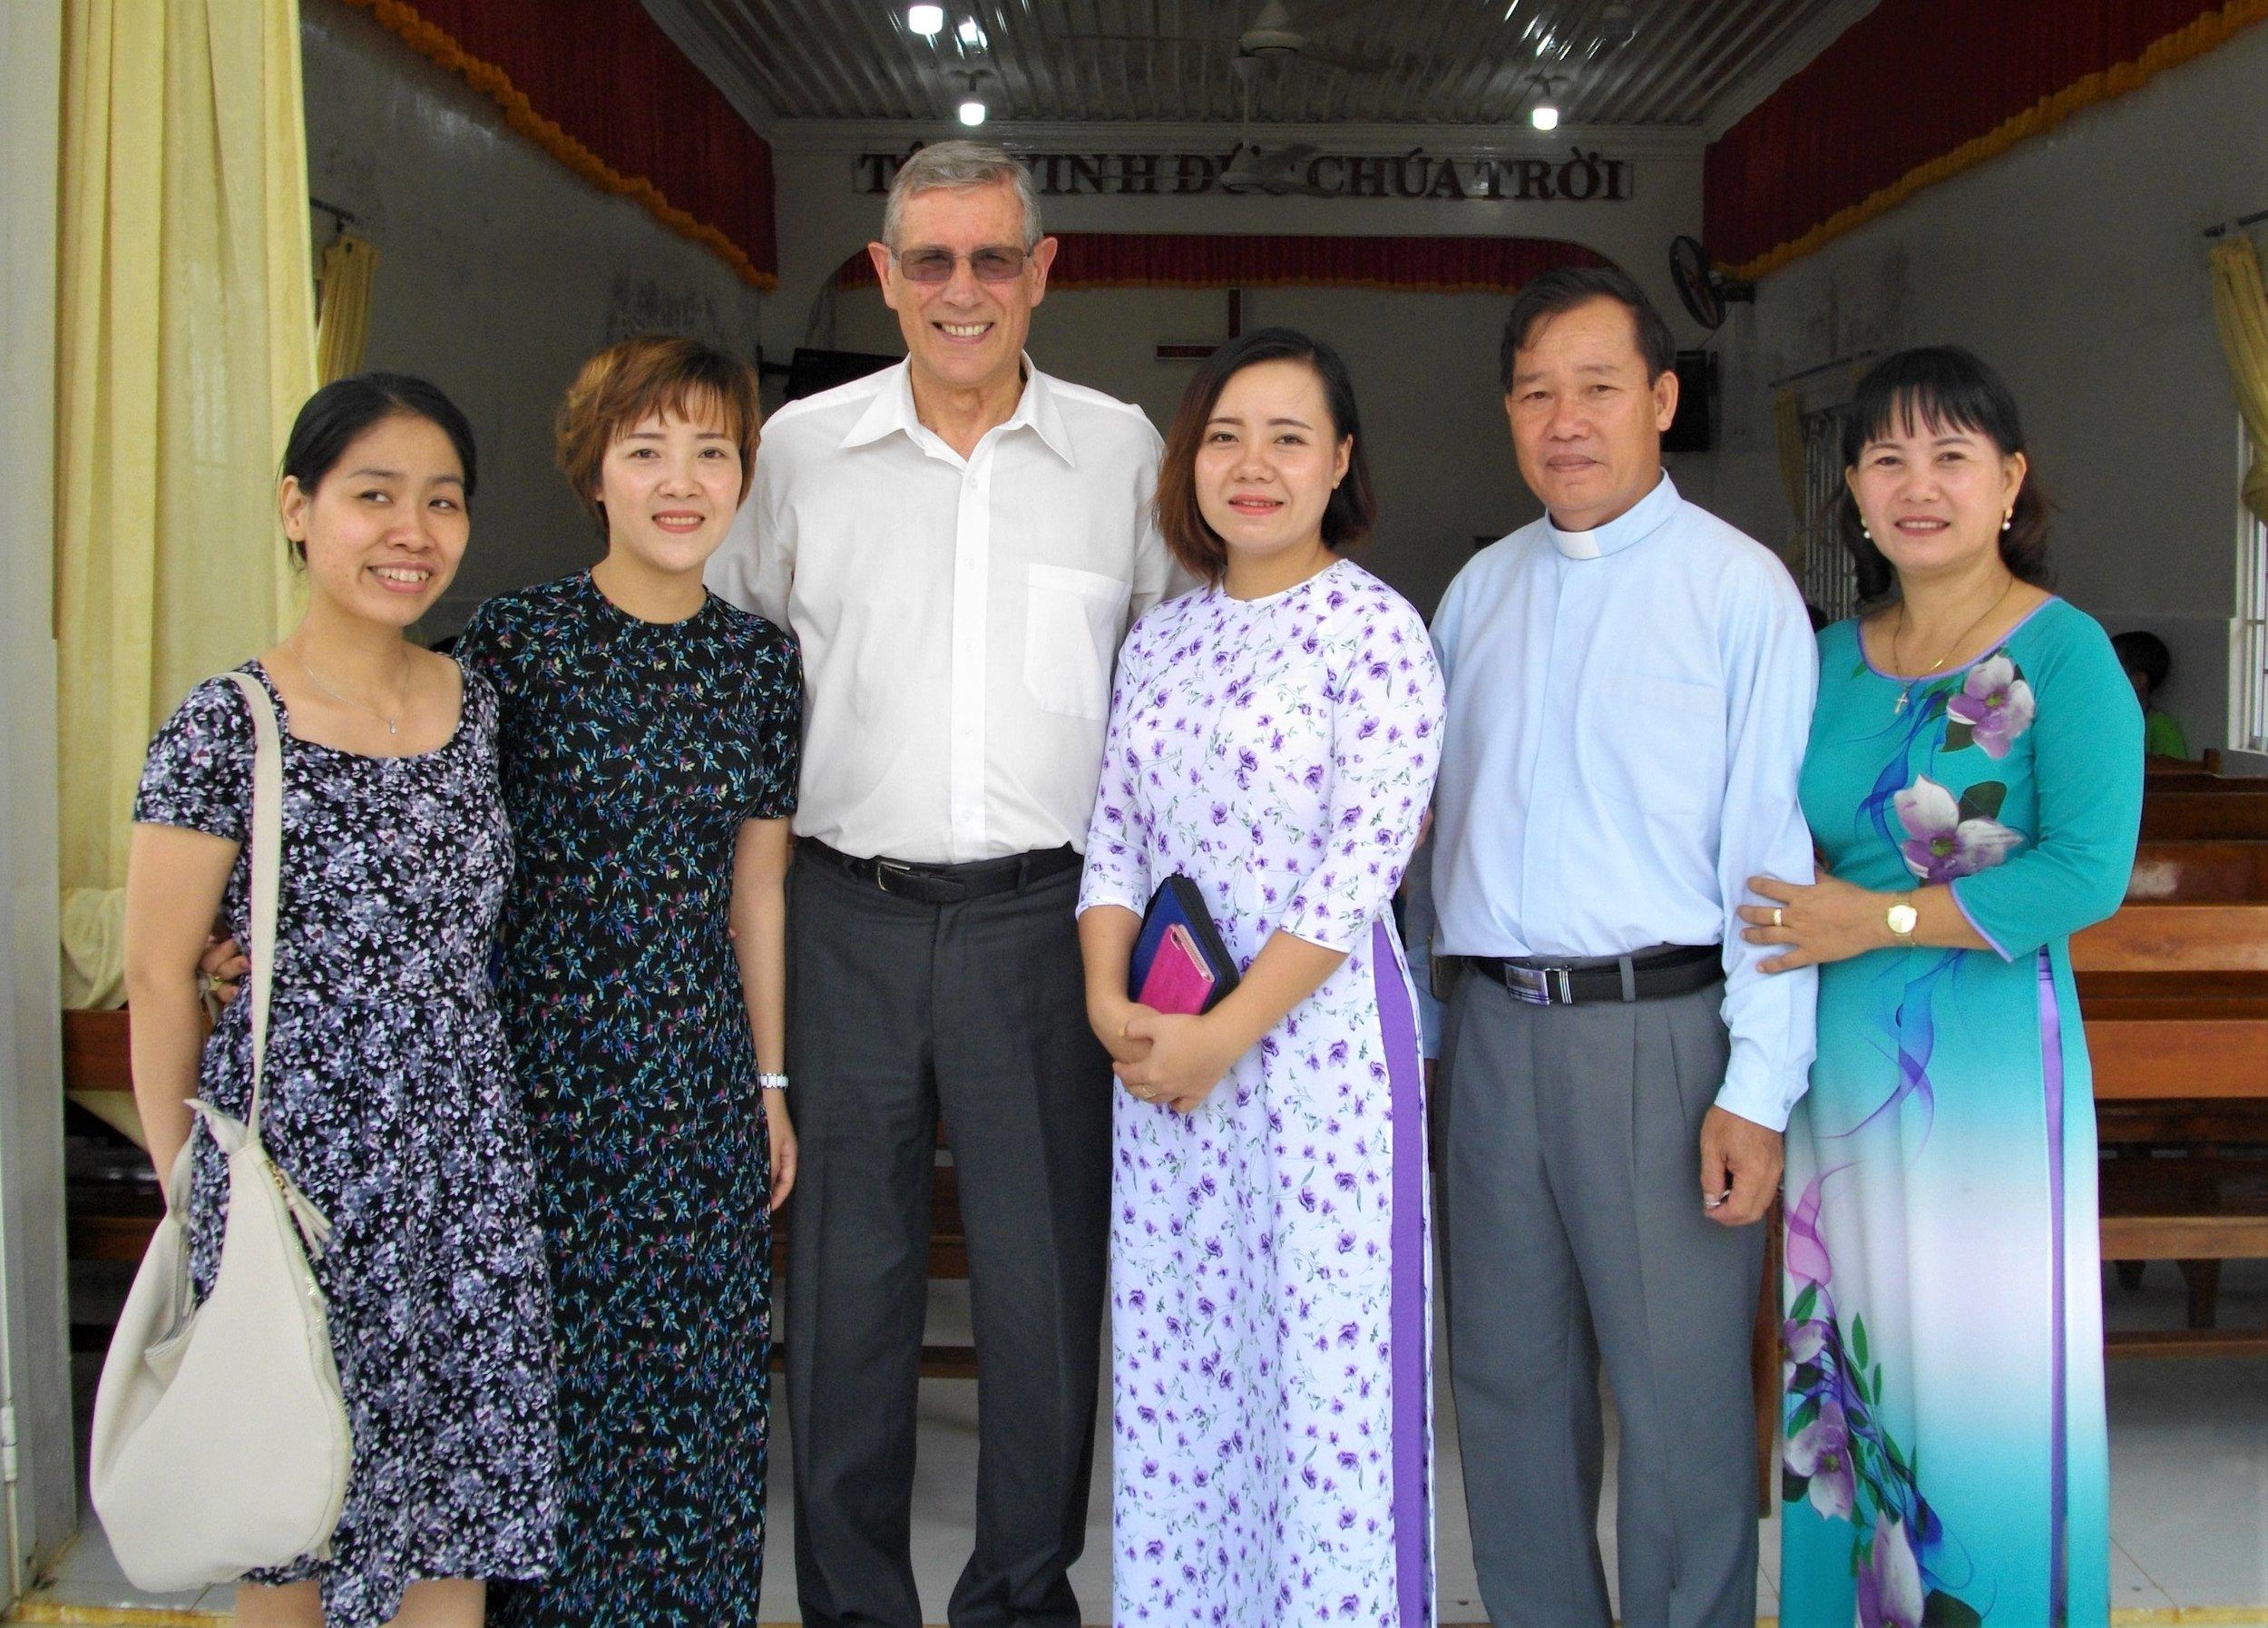 from left:Rachel the interpreter, Thuong, Pastor David Christian,Ngoc (Ruby), Pastor Nhon (leader of ELCV), his wife Tra (Tee).